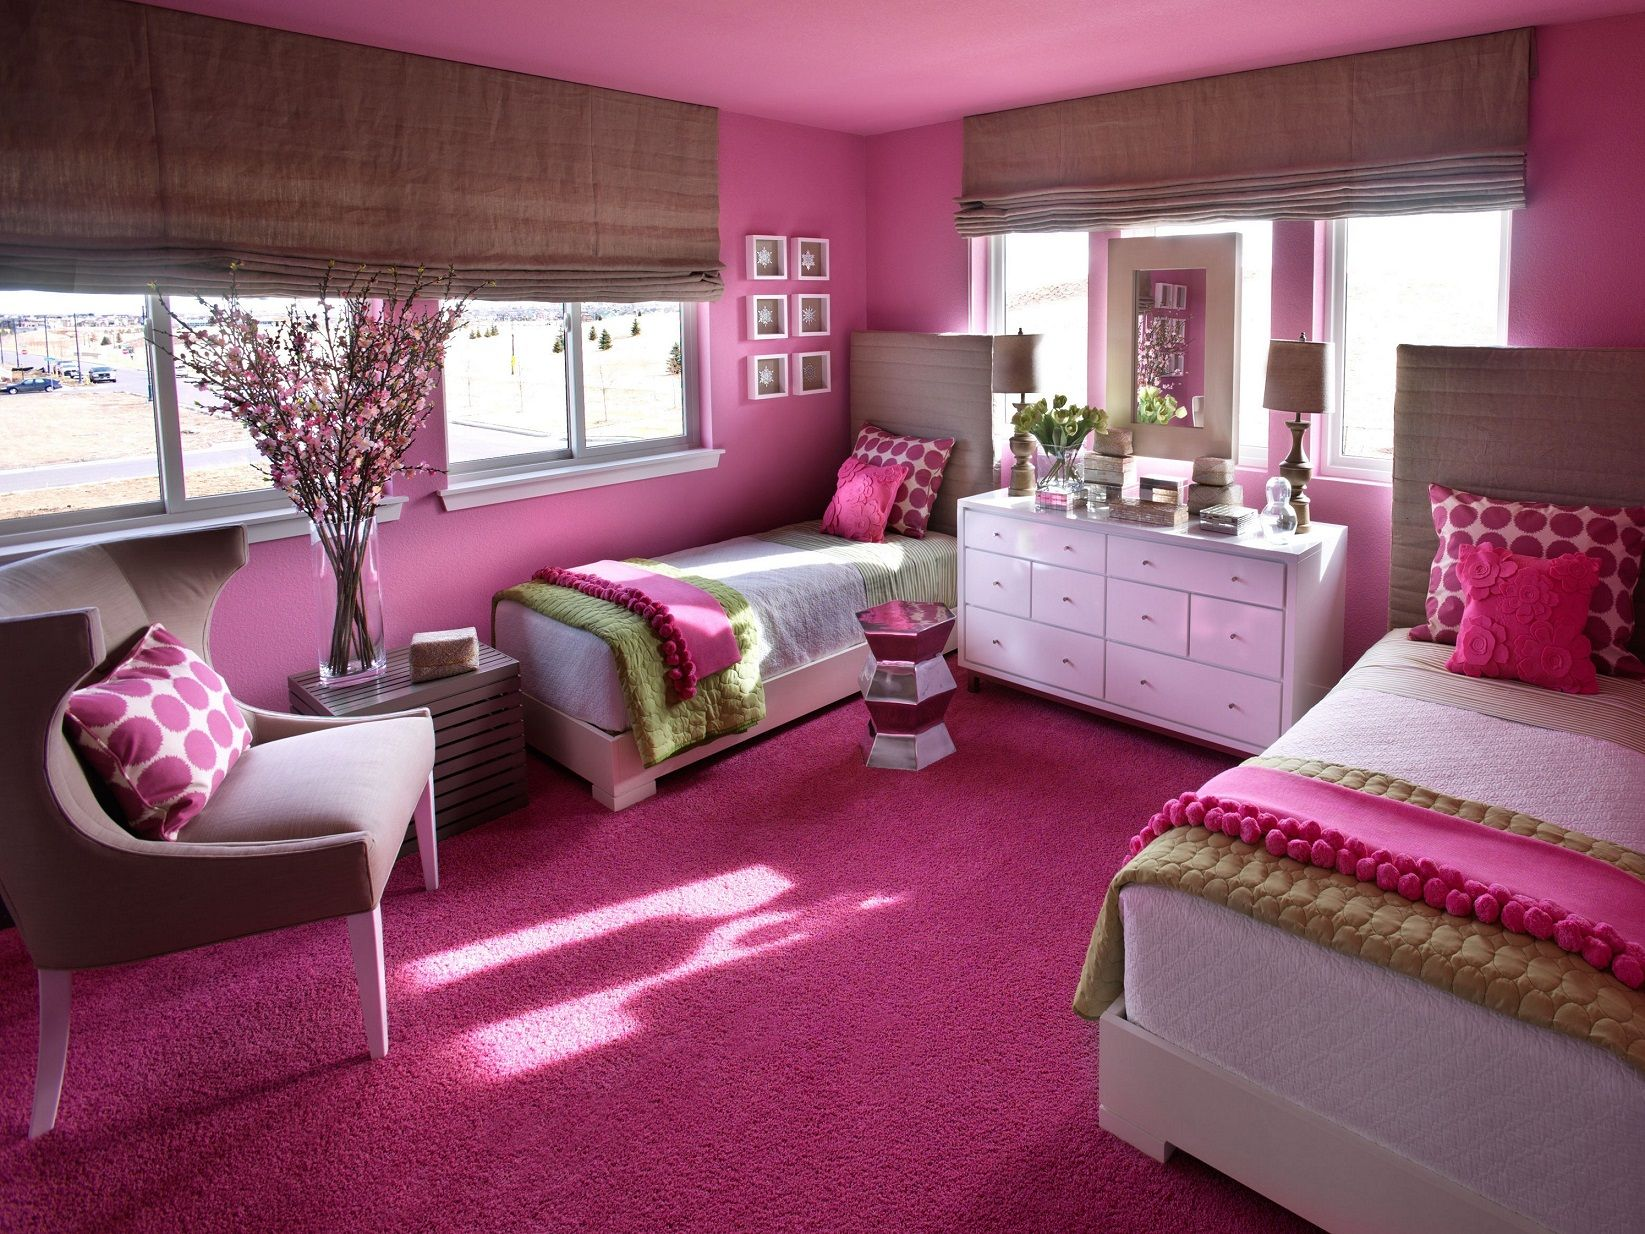 25+ Best Master Bedroom Interior Design Ideas | Bedroom Design Ideas ...